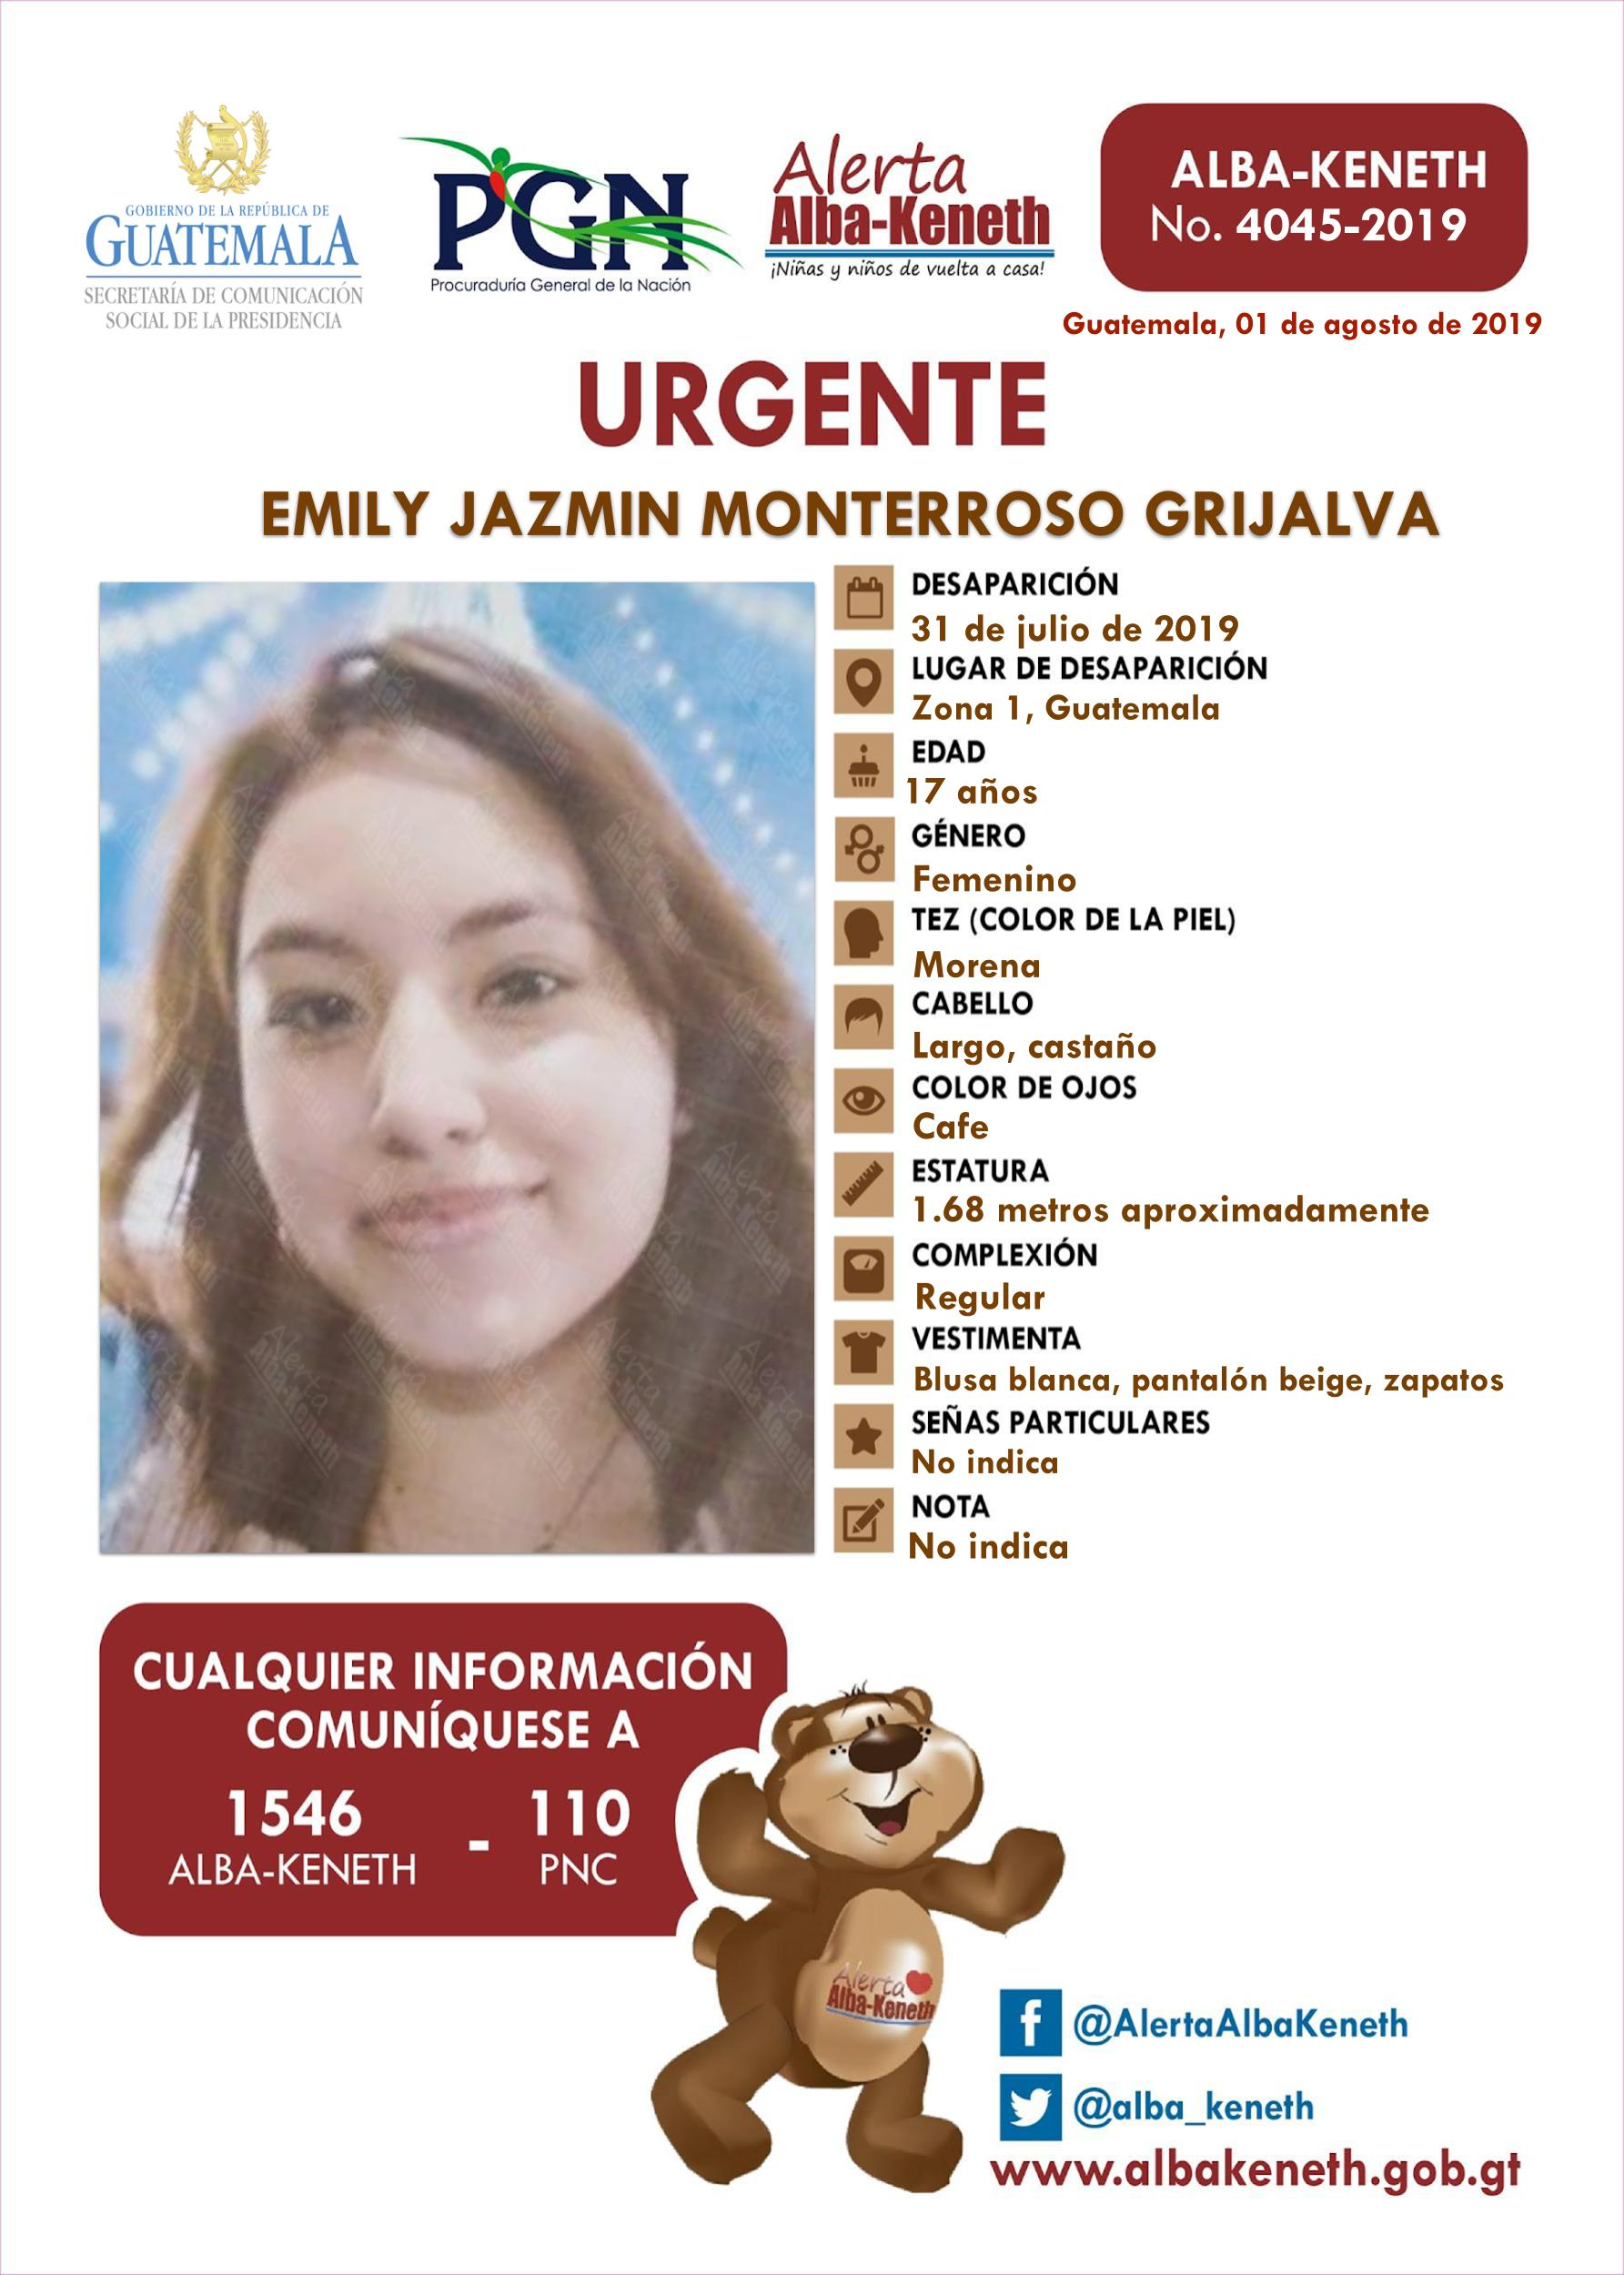 Emily Jazmin Monterroso Grijalva